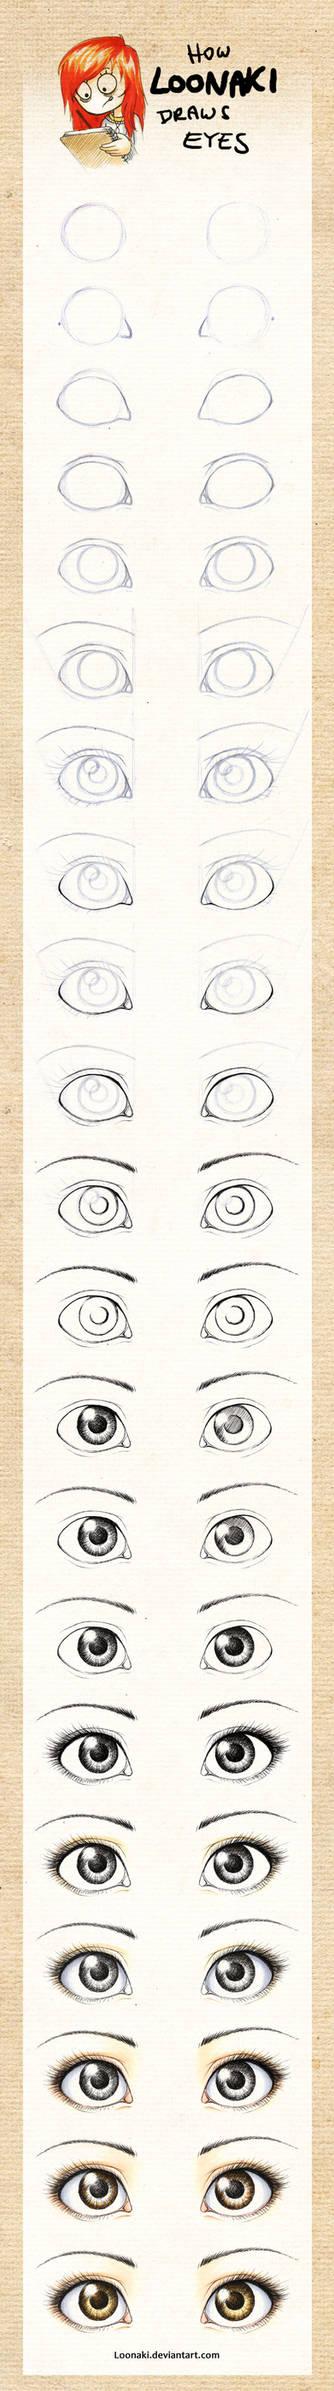 How Loonaki Draws Eyes